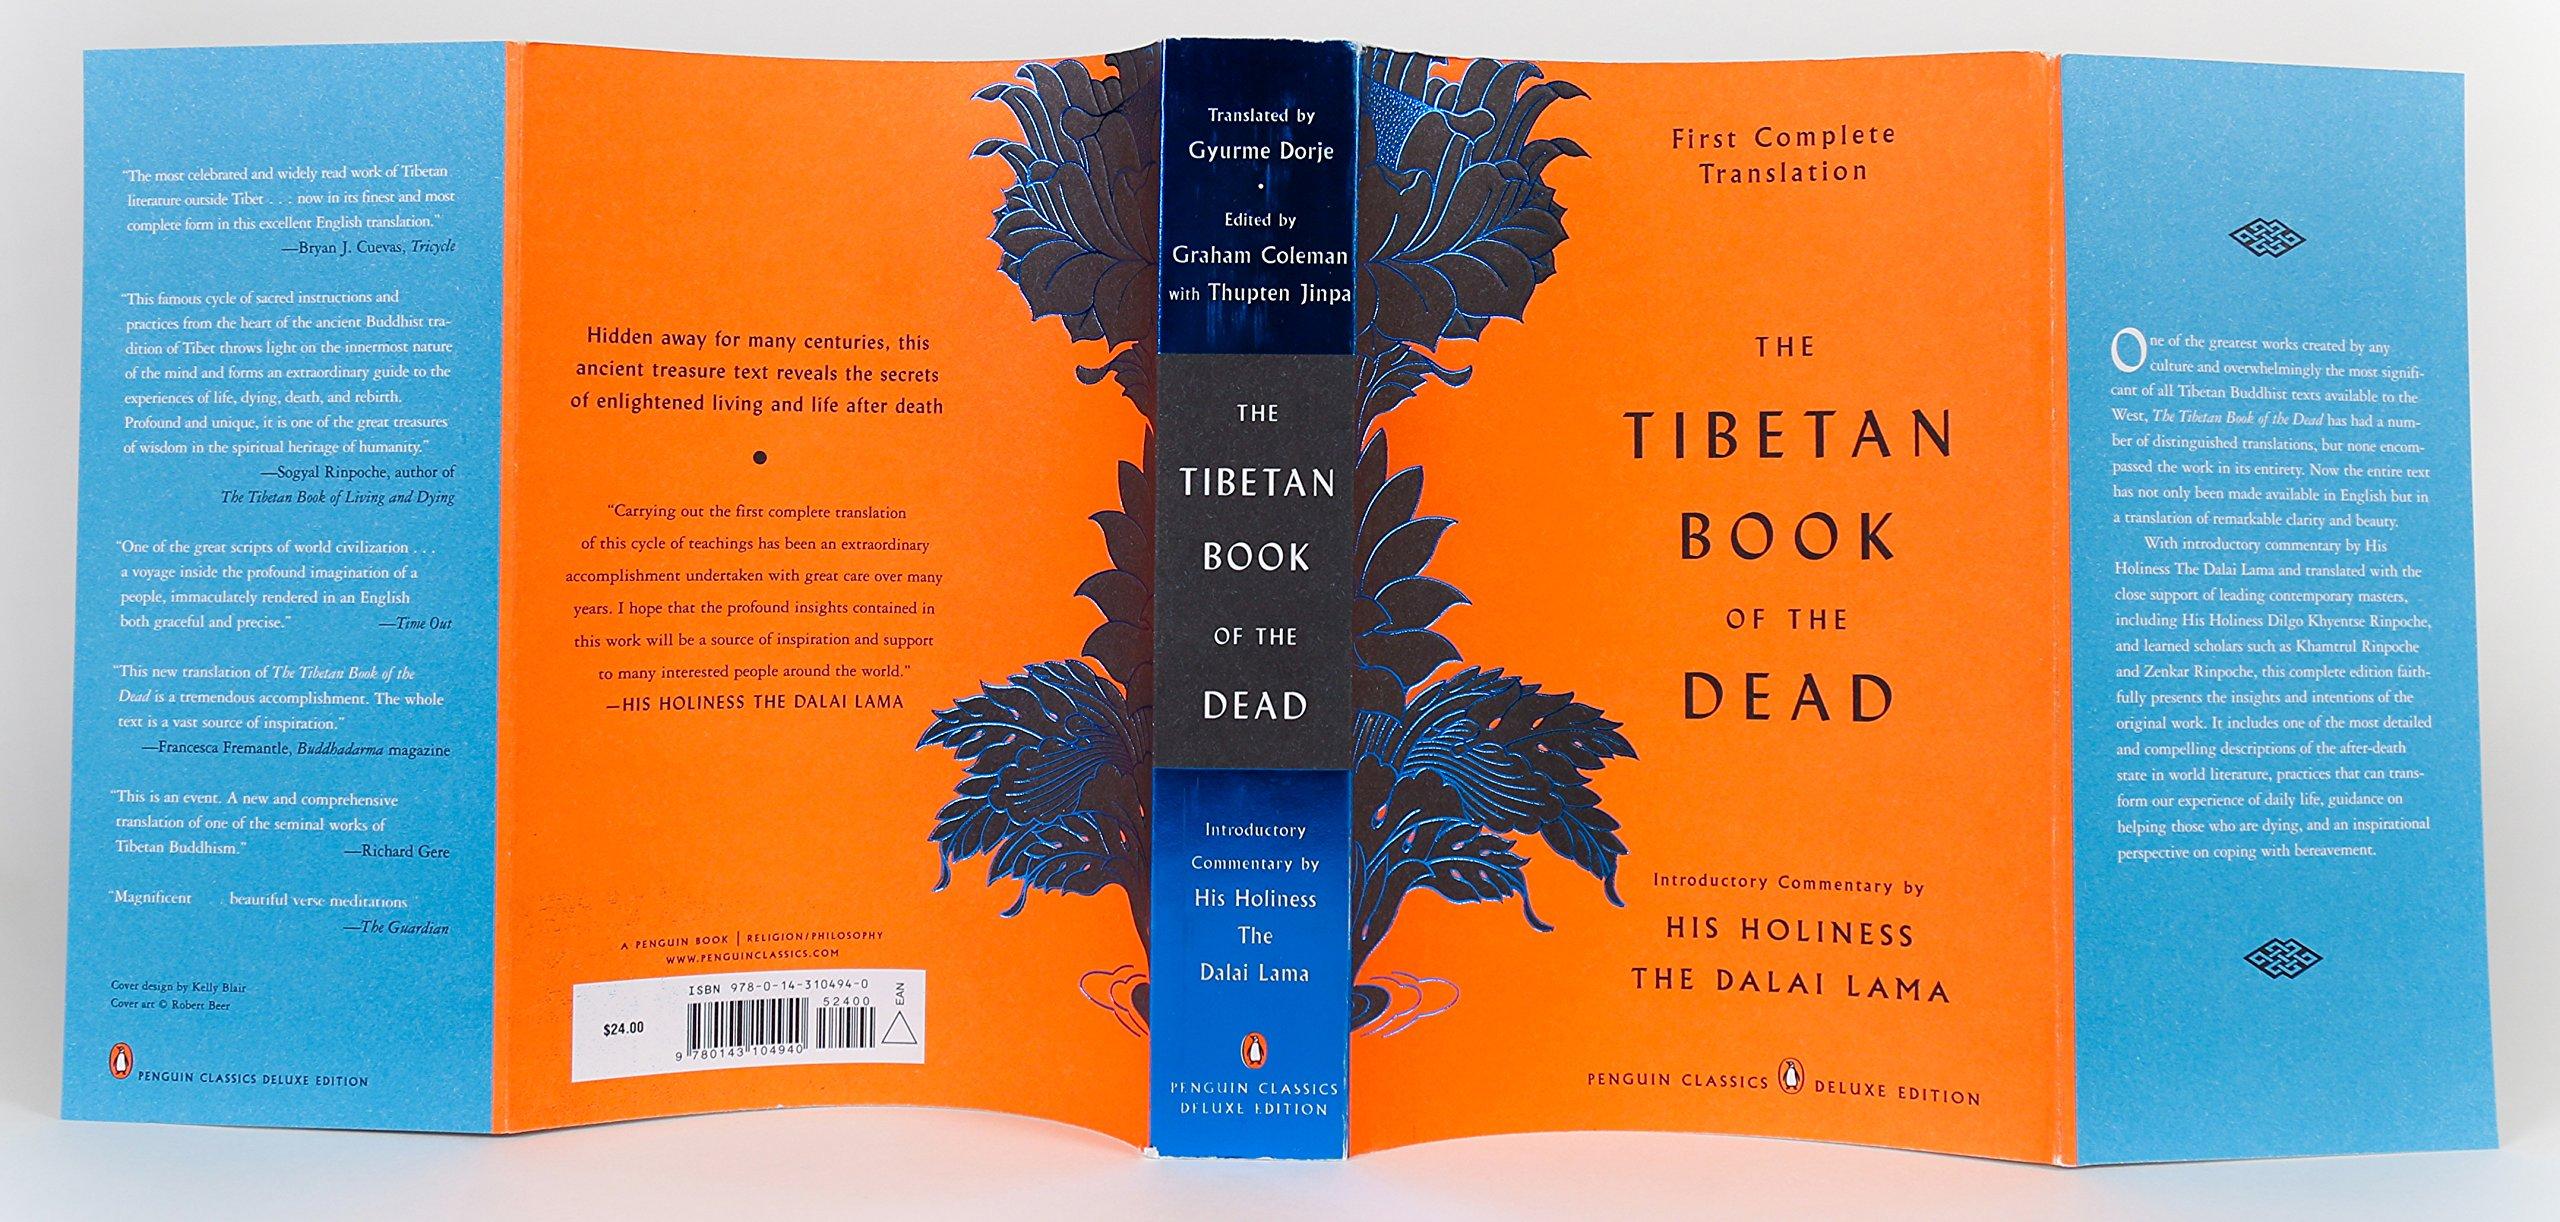 the tibetan book of the dead coleman graham dorje gyurme jinpa thupten